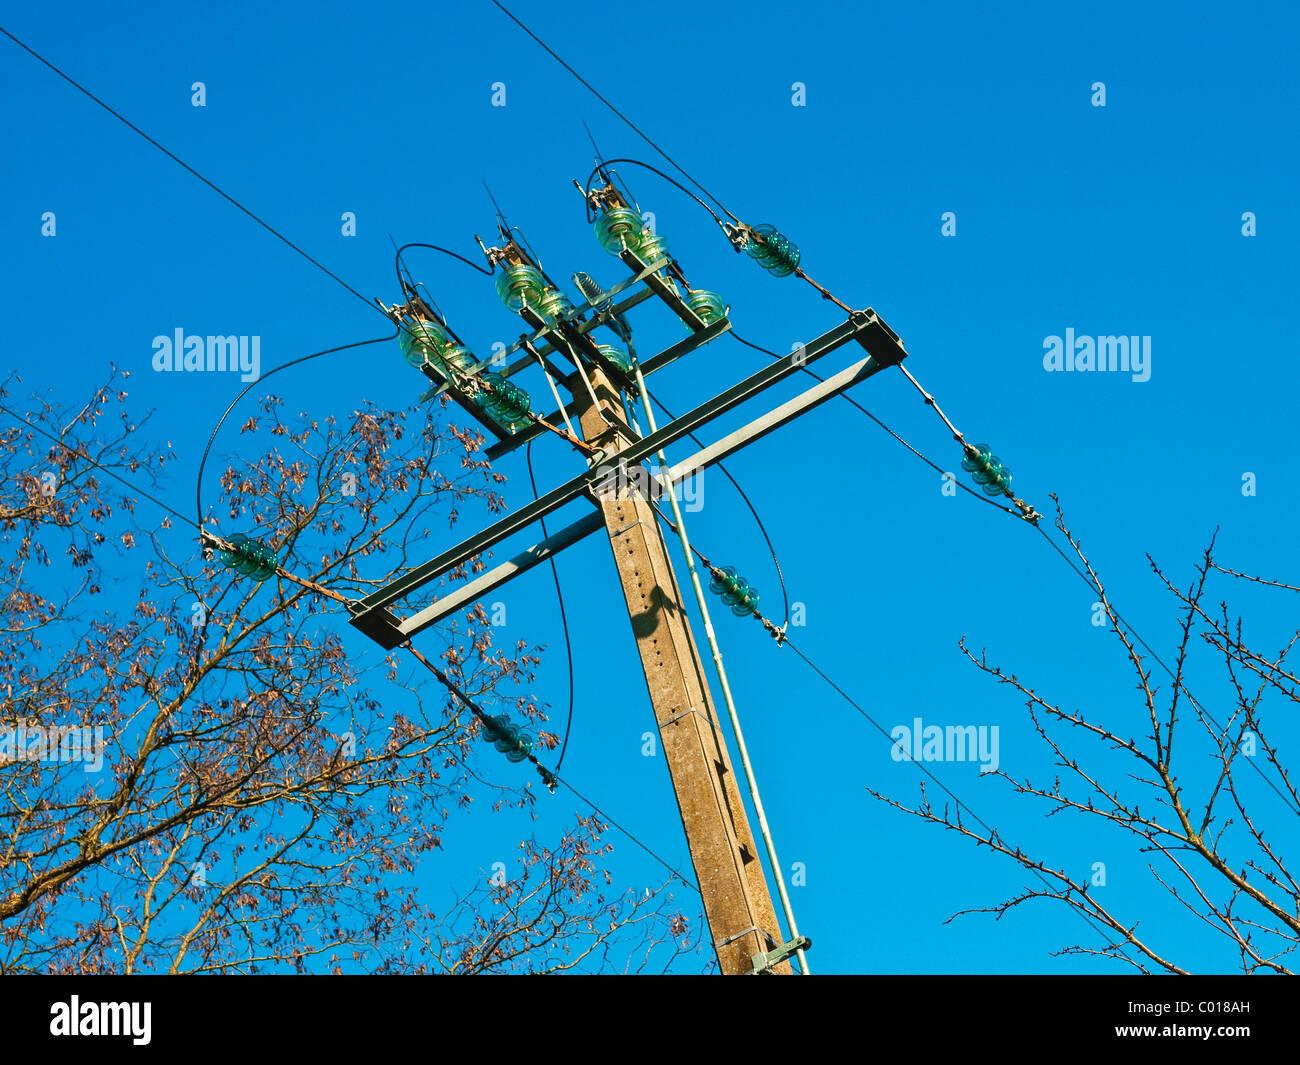 3 Phase Power Supply Stock Photos & 3 Phase Power Supply Stock ...